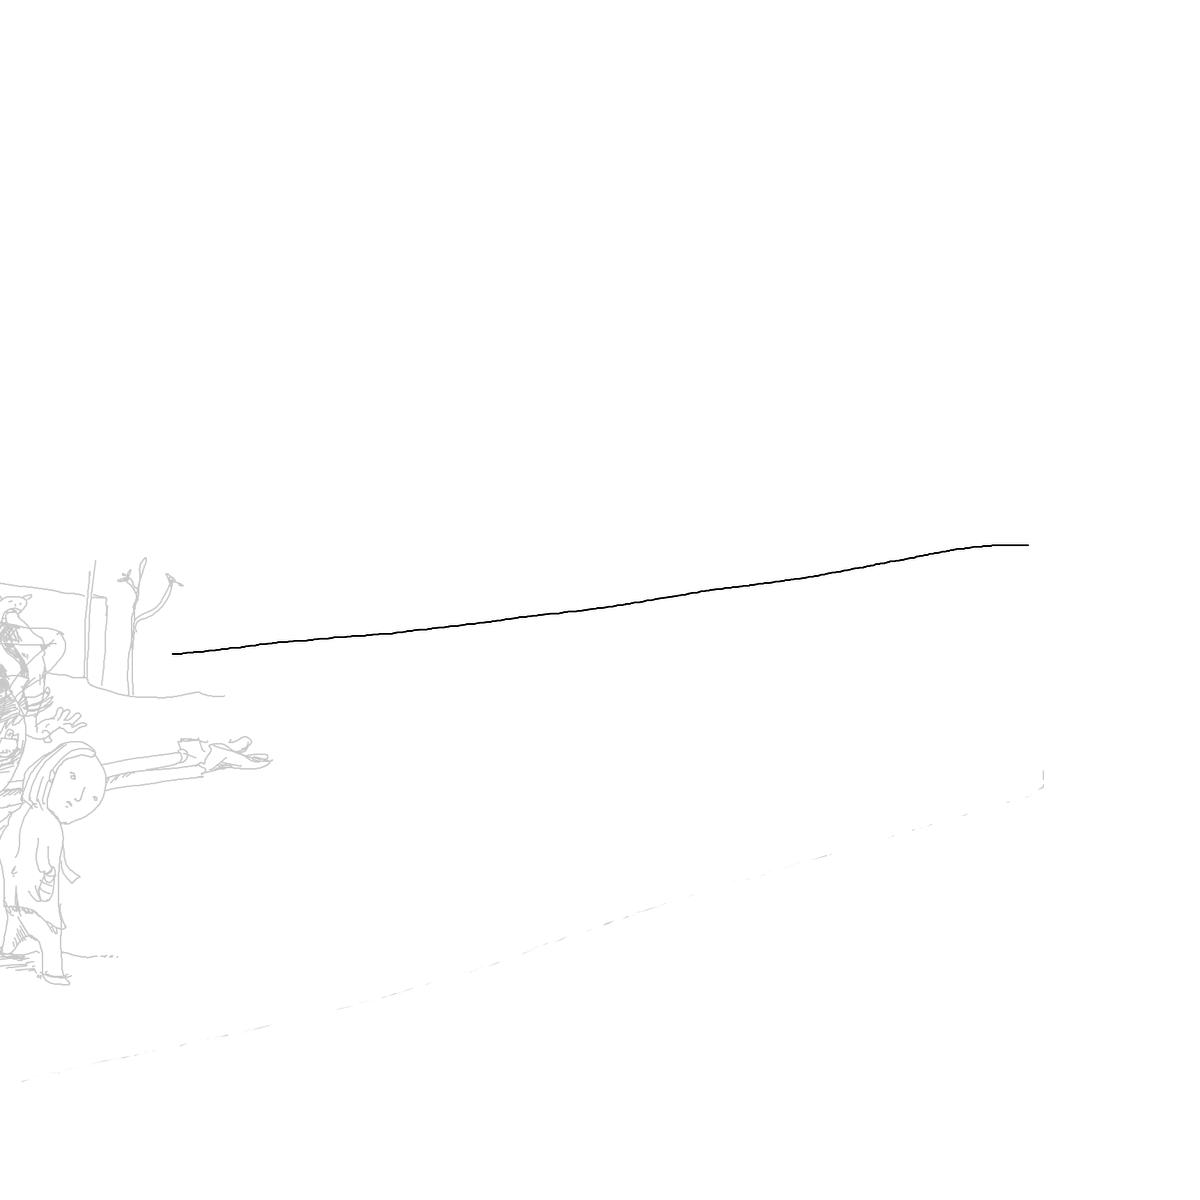 BAAAM drawing#4979 lat:78.7422485351562500lng: -18.1122093200683600